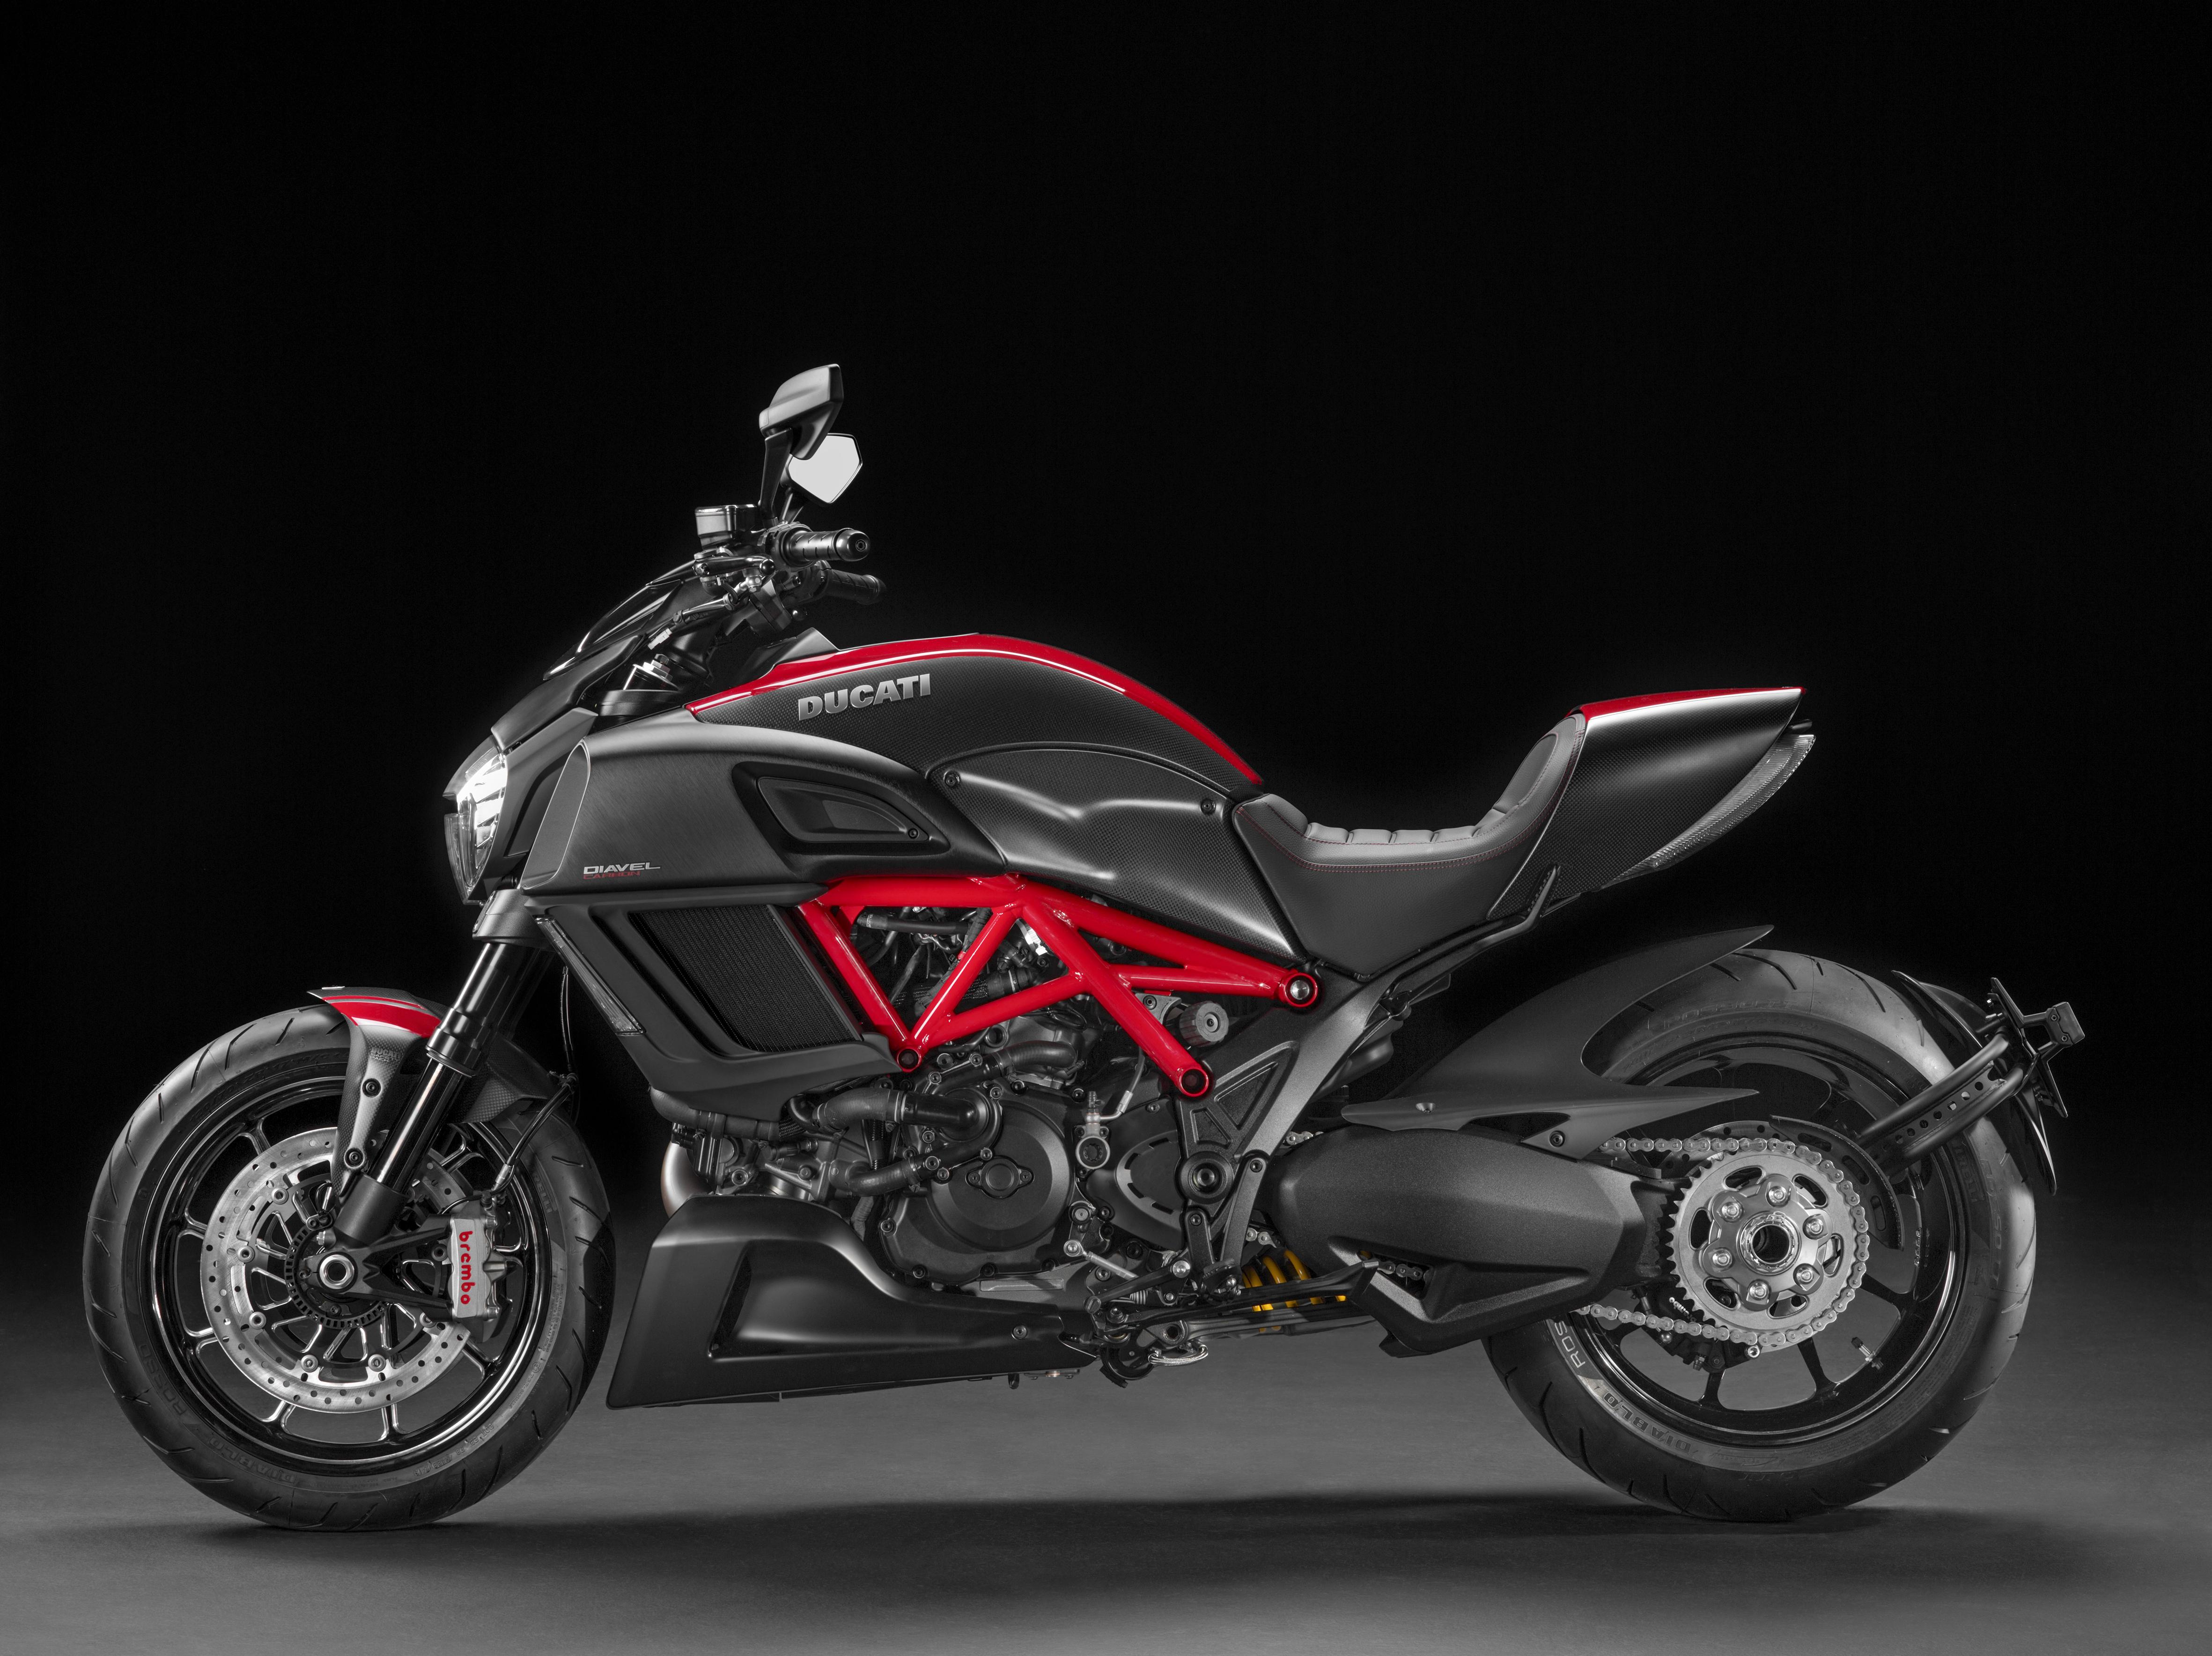 Updated Ducati Diavel unveiled